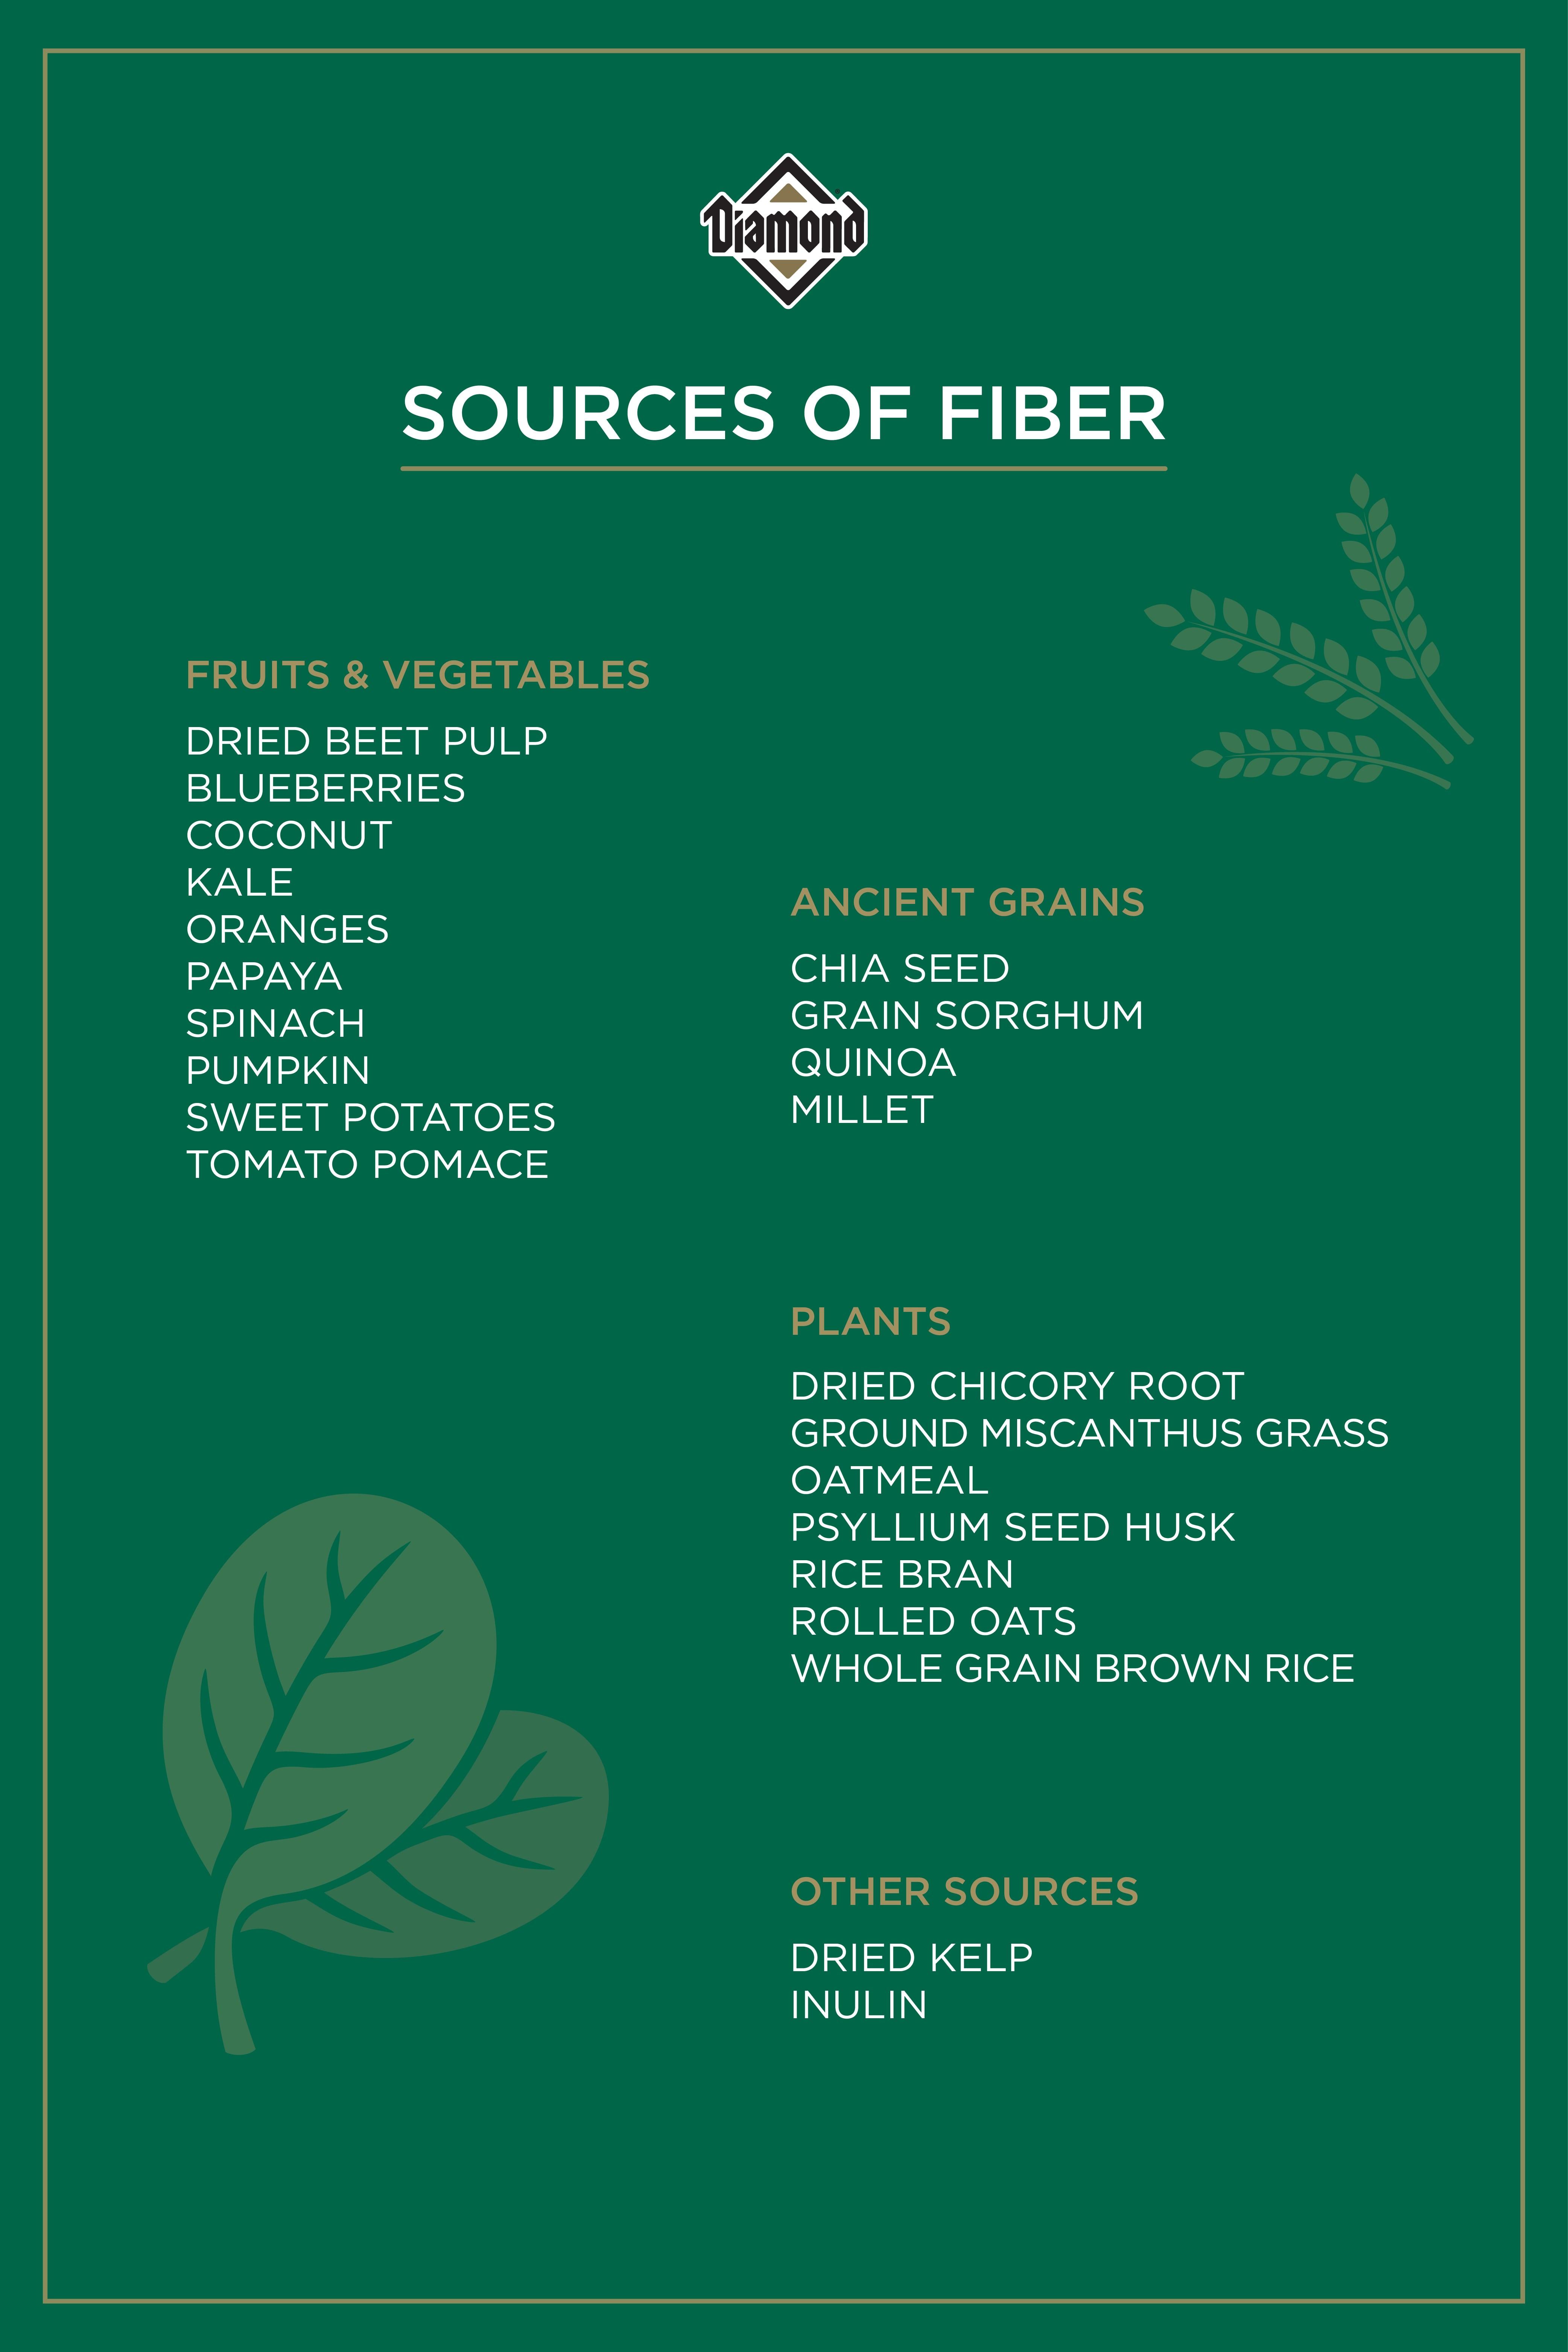 Sources of Fiber Guide | Diamond Pet Foods